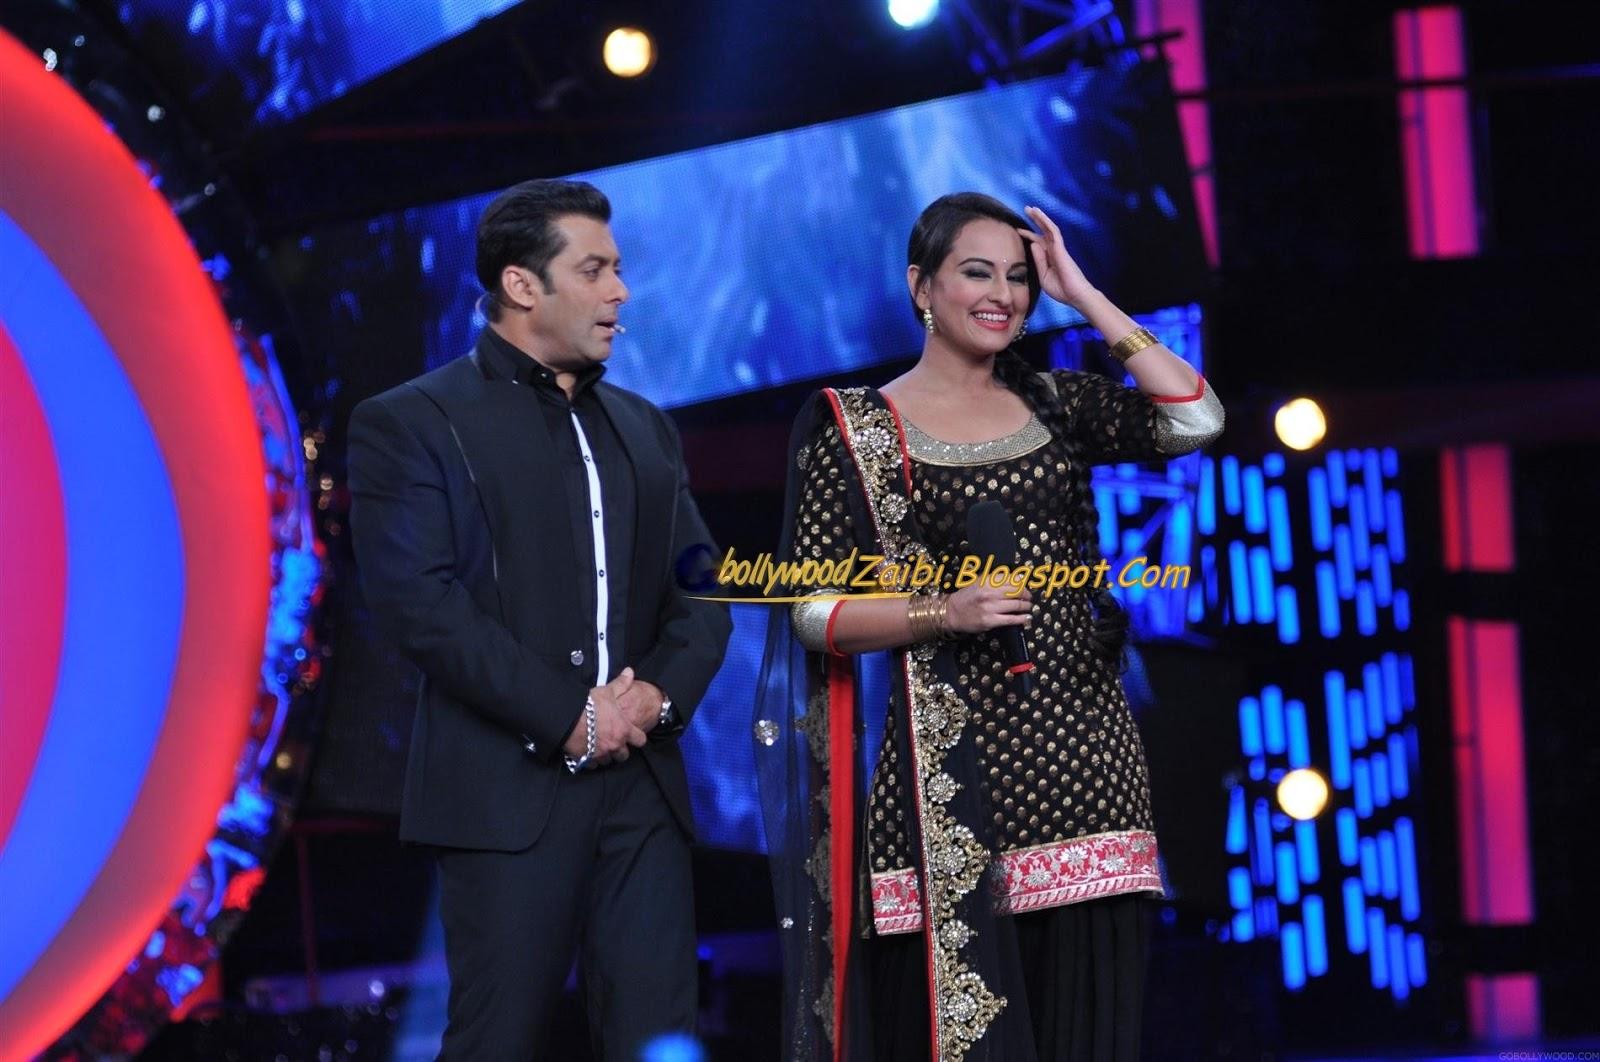 Son Of Sardar Movie Wallpapers Hd: Salman Khan In Son Of Sardar HD Wallpaper